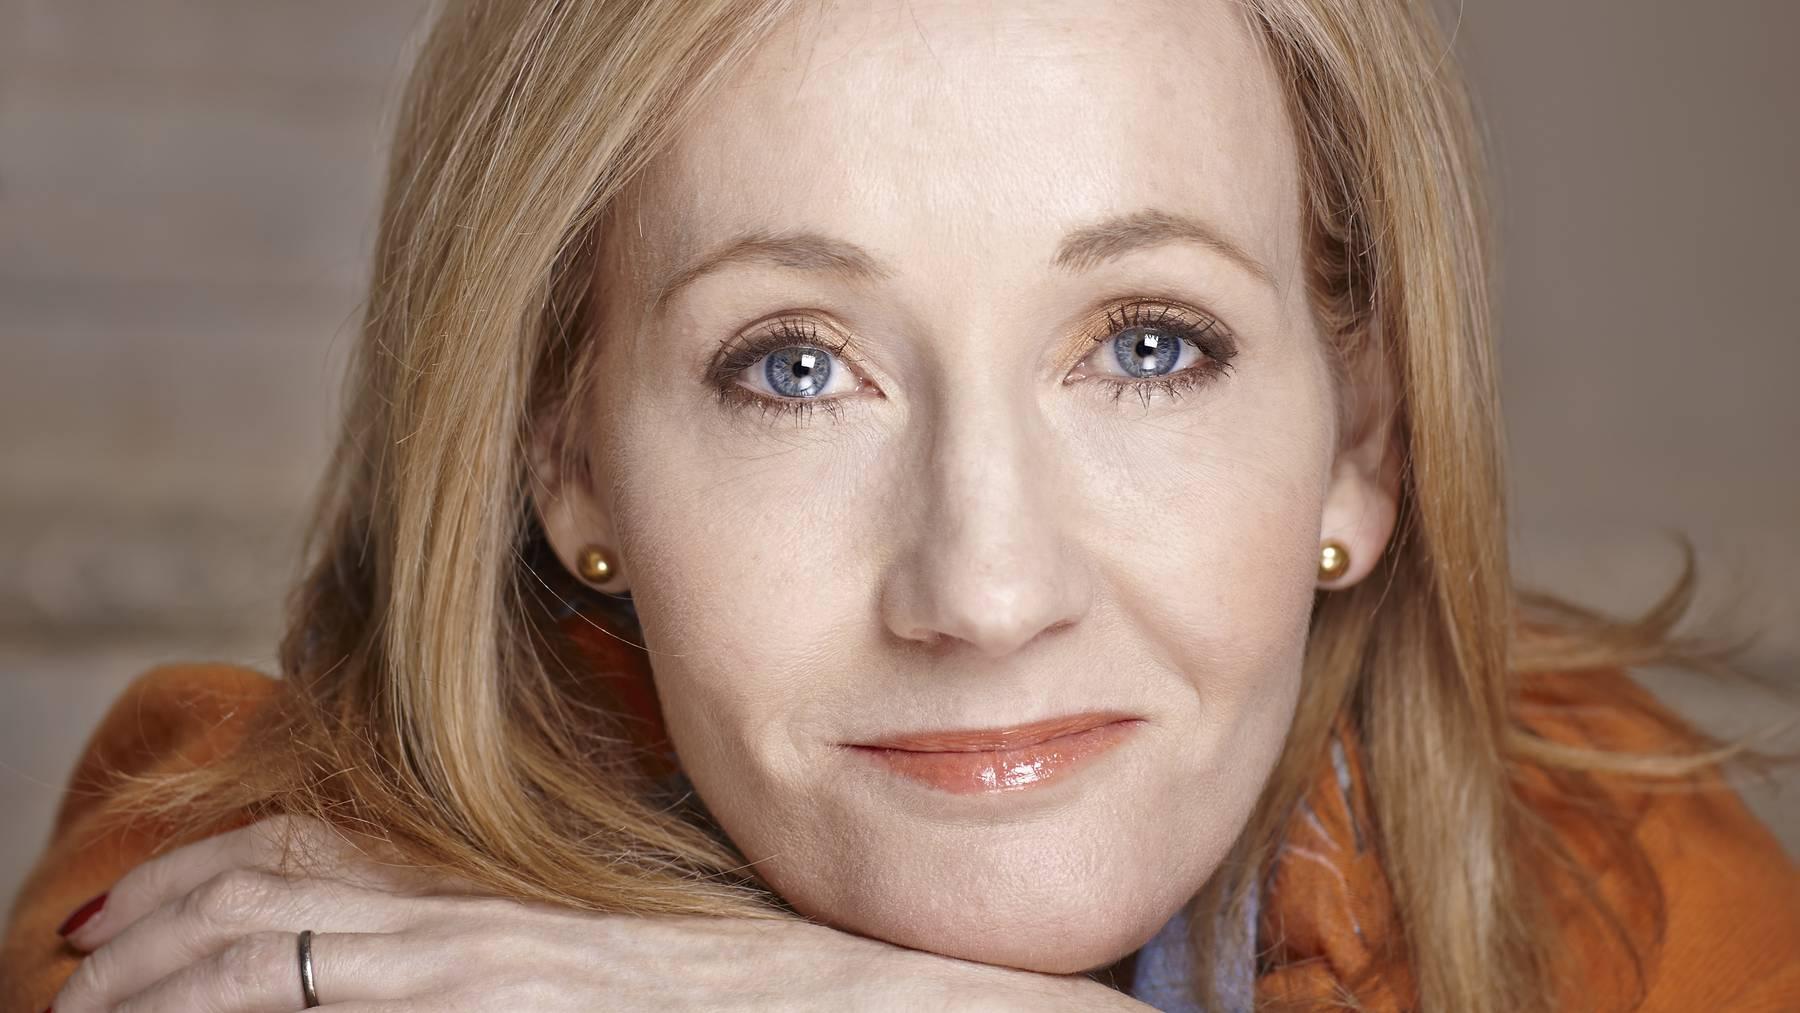 J.K. Rowling feiert heute ihren 50. Geburtstag